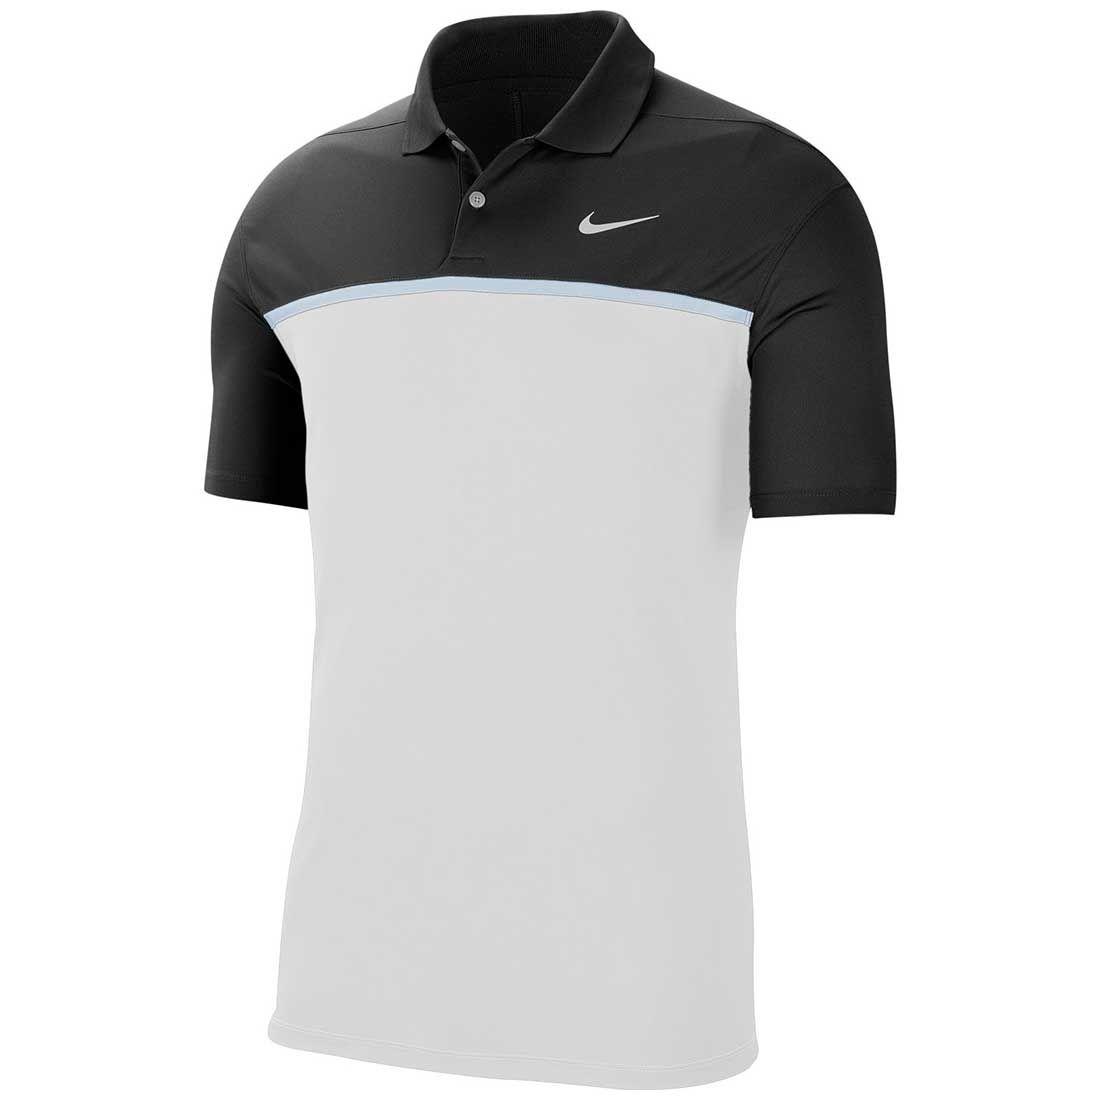 Robusto Cadena lapso  Buy Nike Dri-FIT Victory Colorblock Polo | Golf Discount